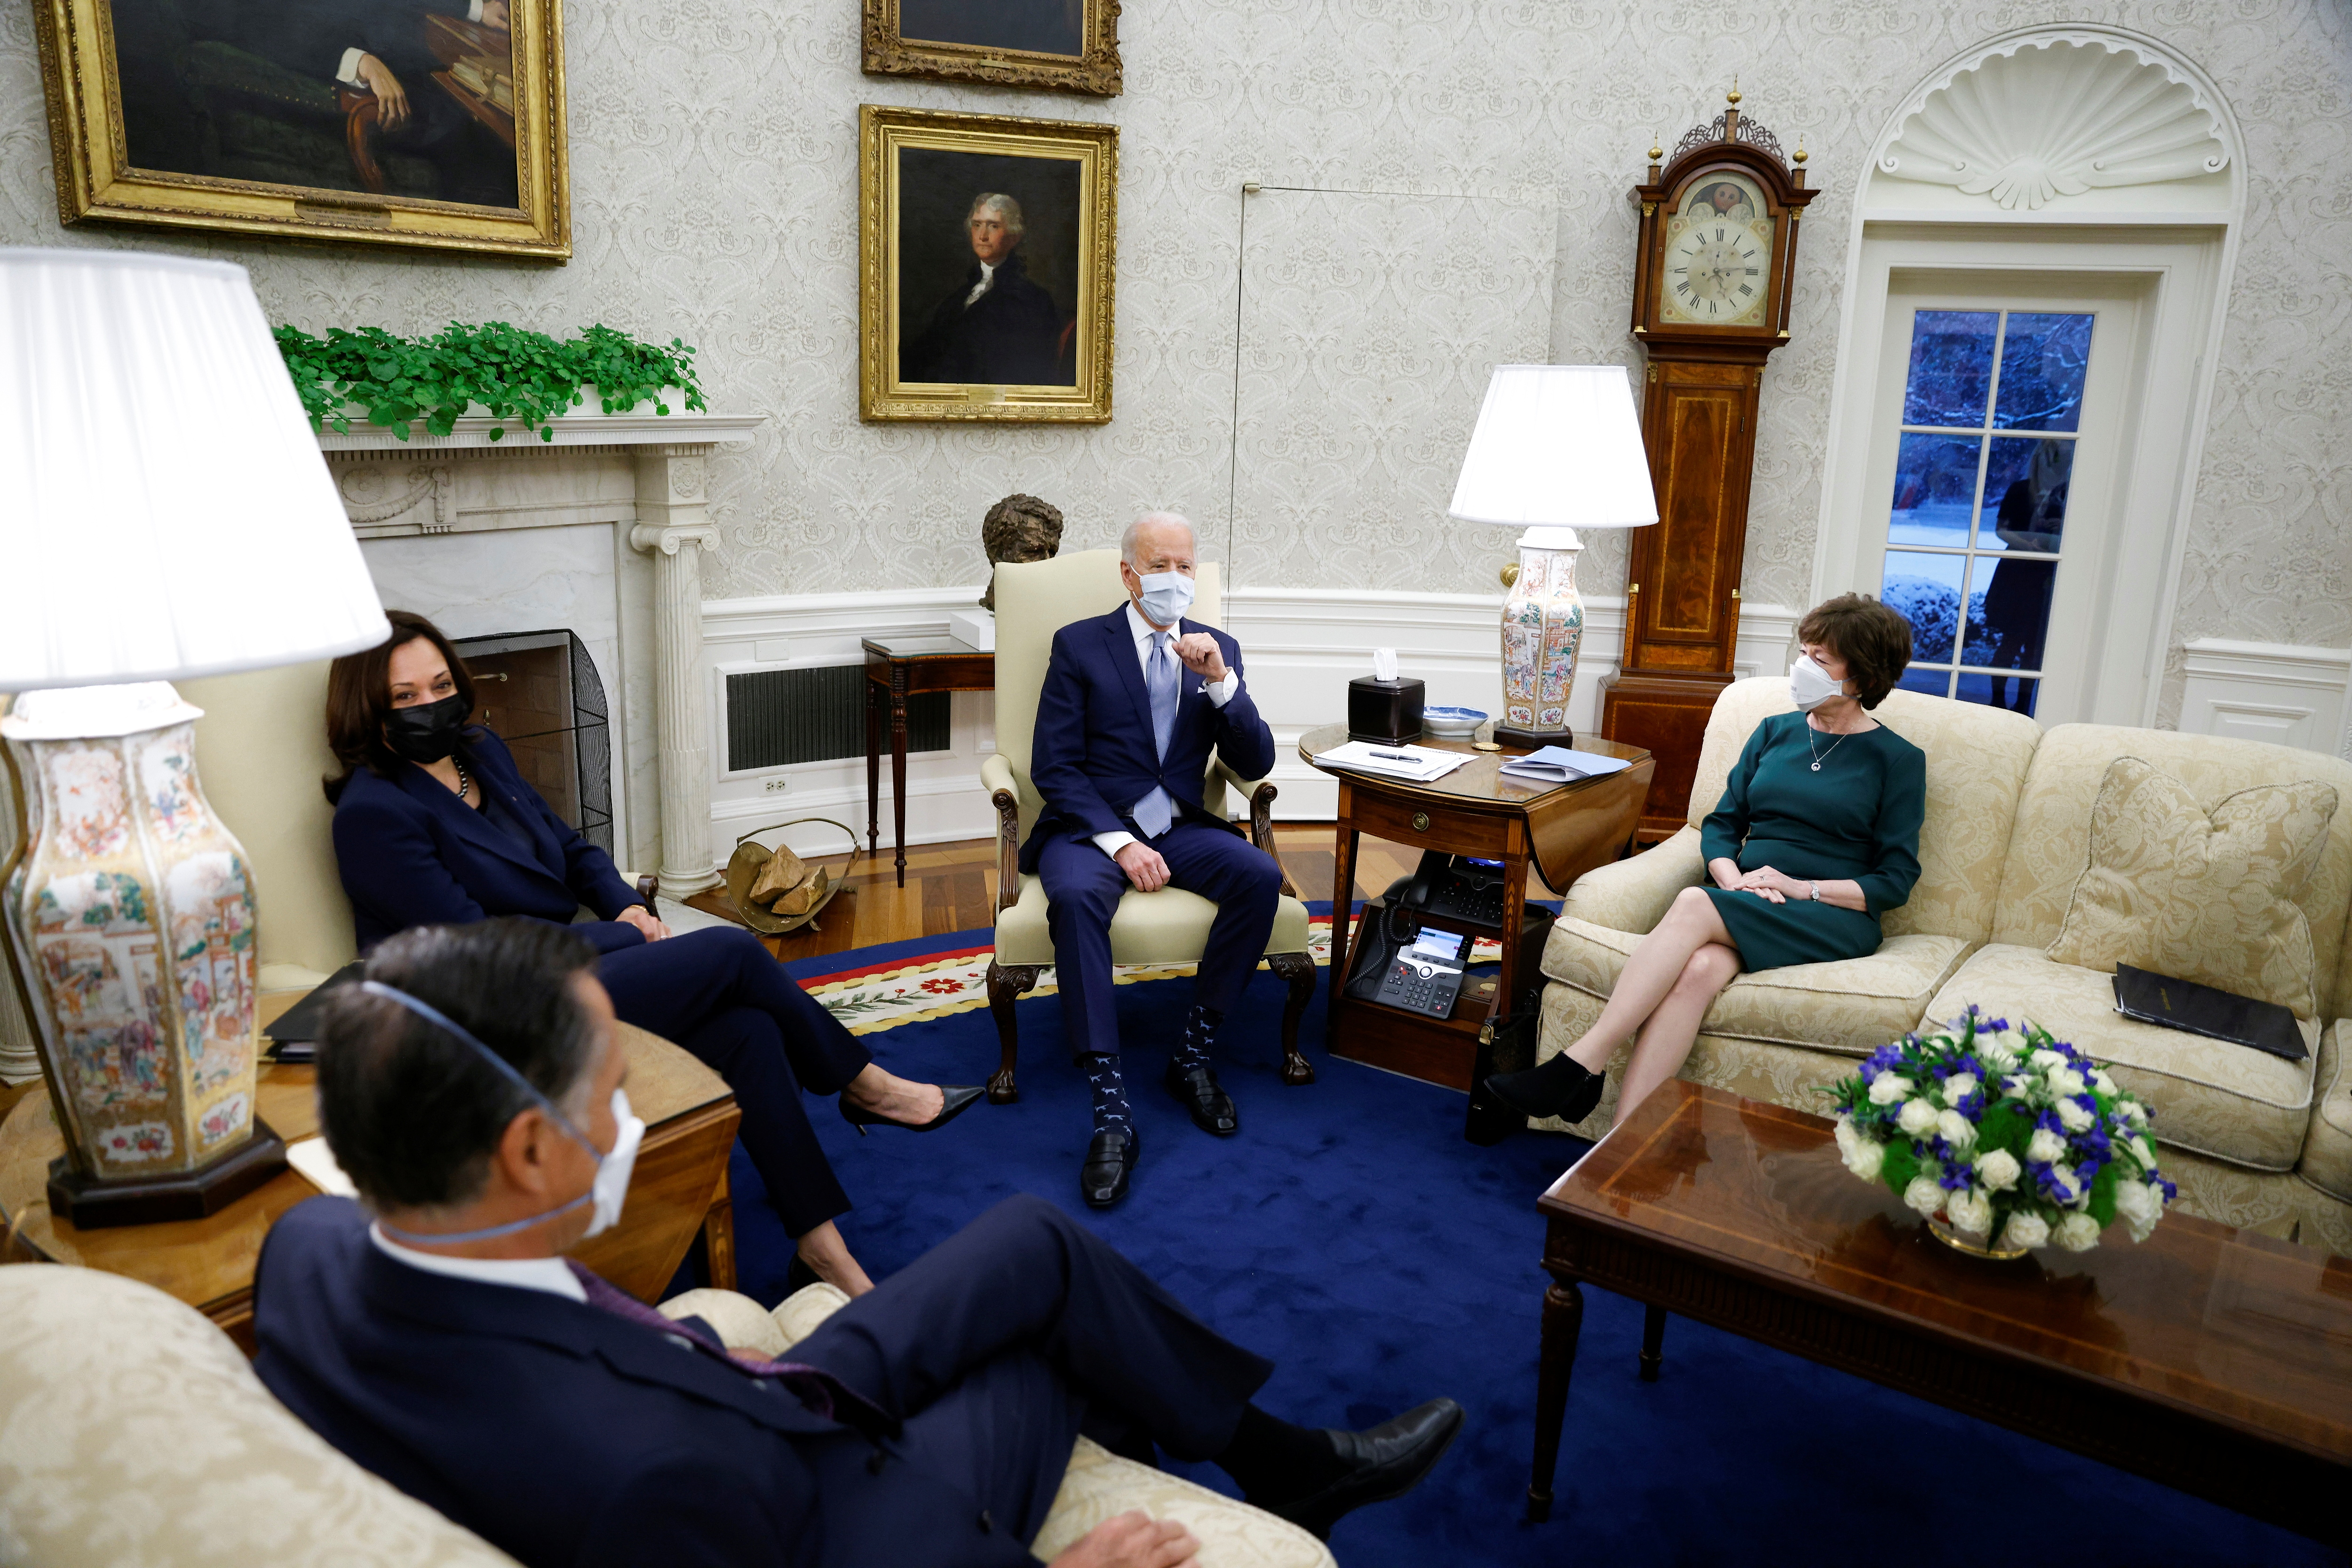 U.S. President Joe Biden and Vice President Kamala Harris meet with a group of Republican Senators to discuss coronavirus disease (COVID-19) federal aid legislation inside the Oval Office at the White House in Washington, U.S., February 1, 2021. REUTERS/Tom Brenner